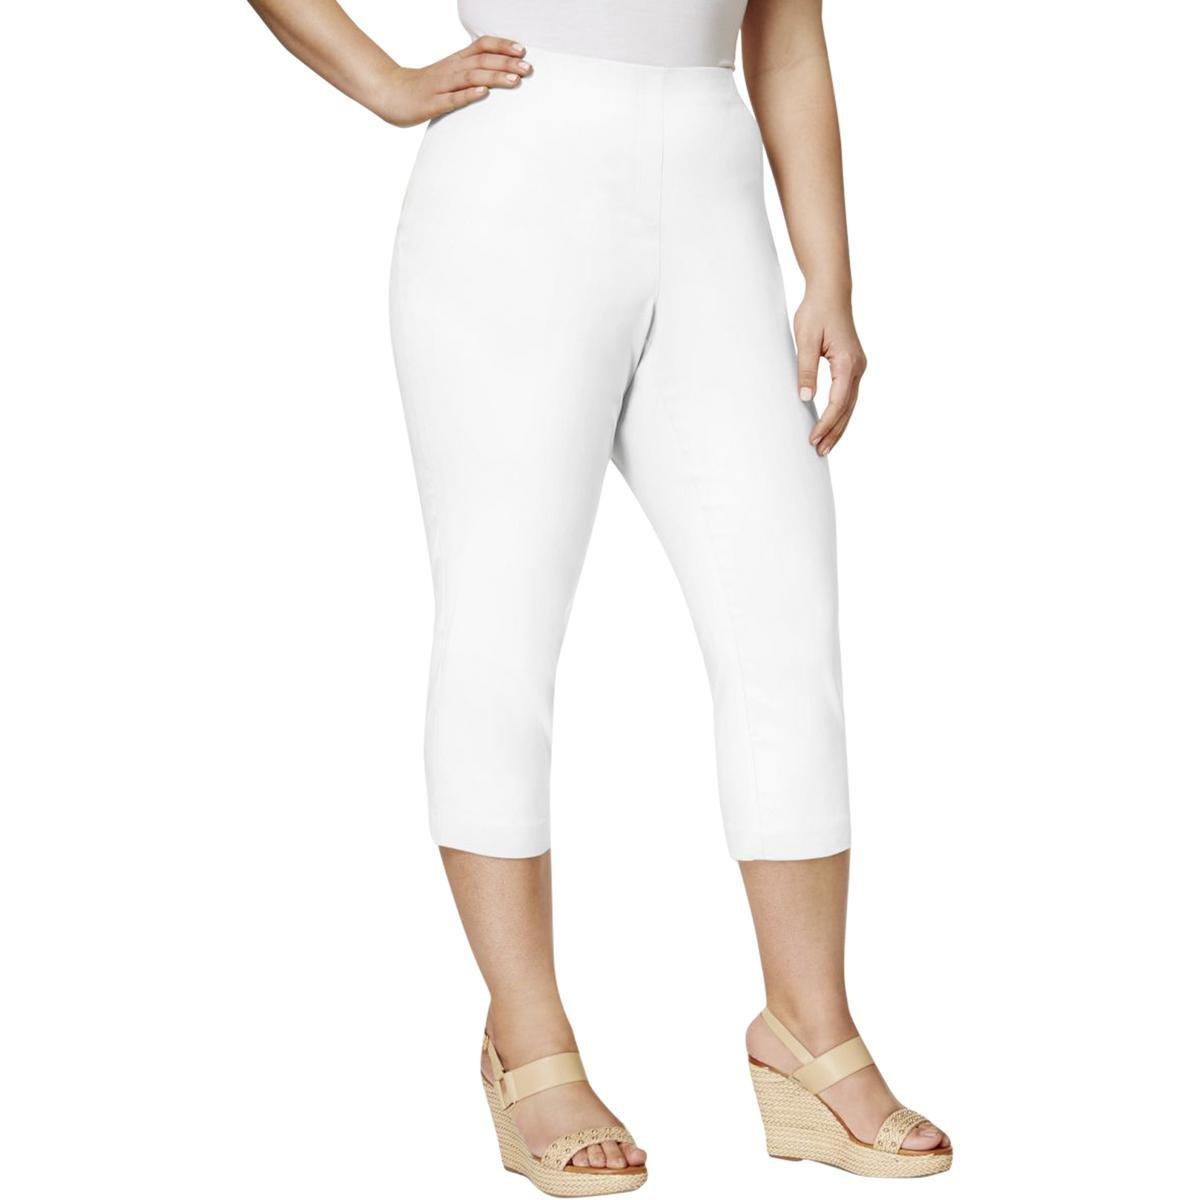 Style & Co. Womens Plus Comfort Waist Jegging Capri Jeans White 24W